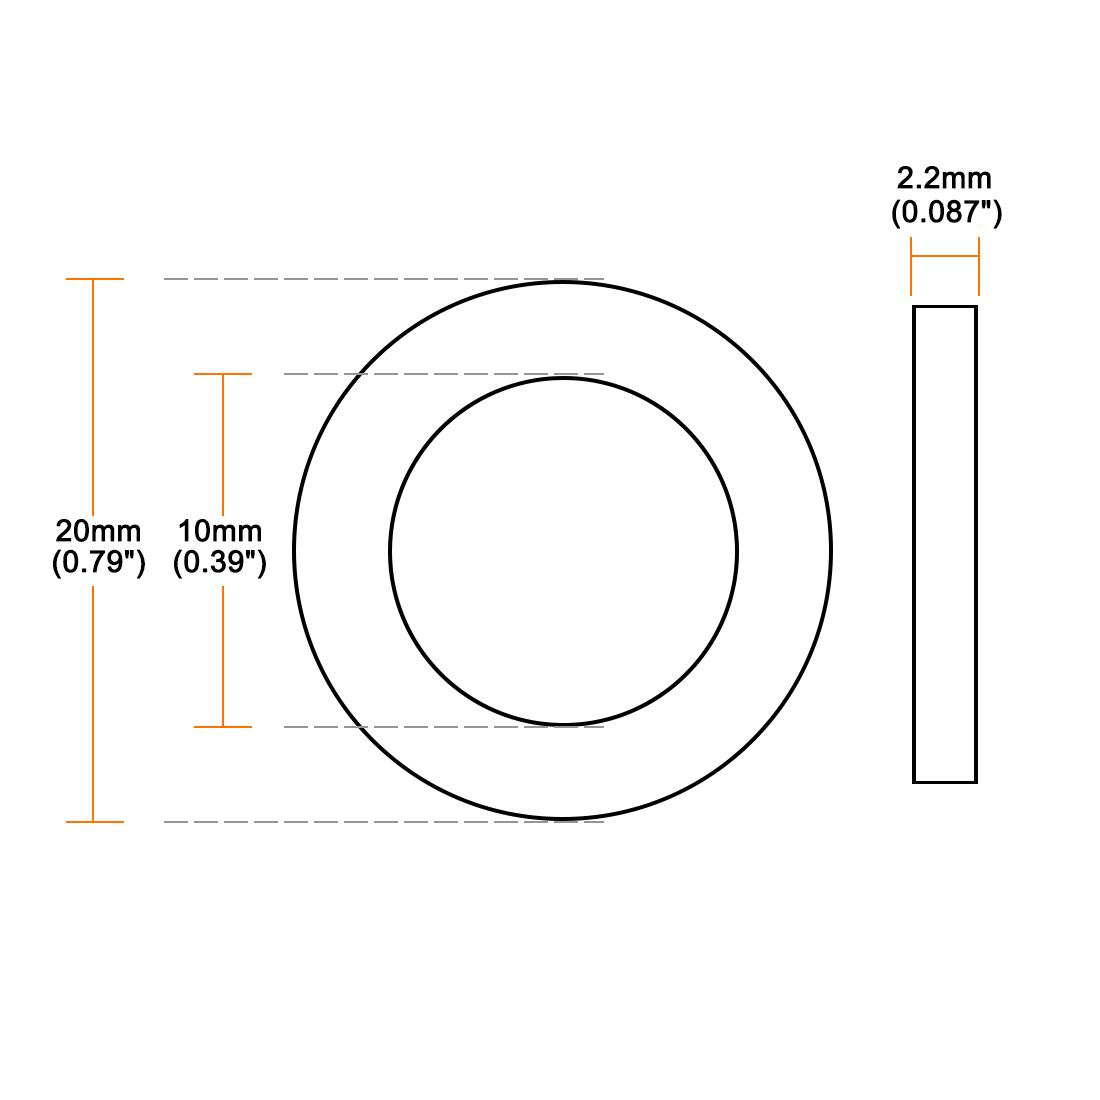 Rubber Flat Washers, 10mm Inner Diameter 20mm OD 2.2mm Thick 20pcs - image 3 de 4